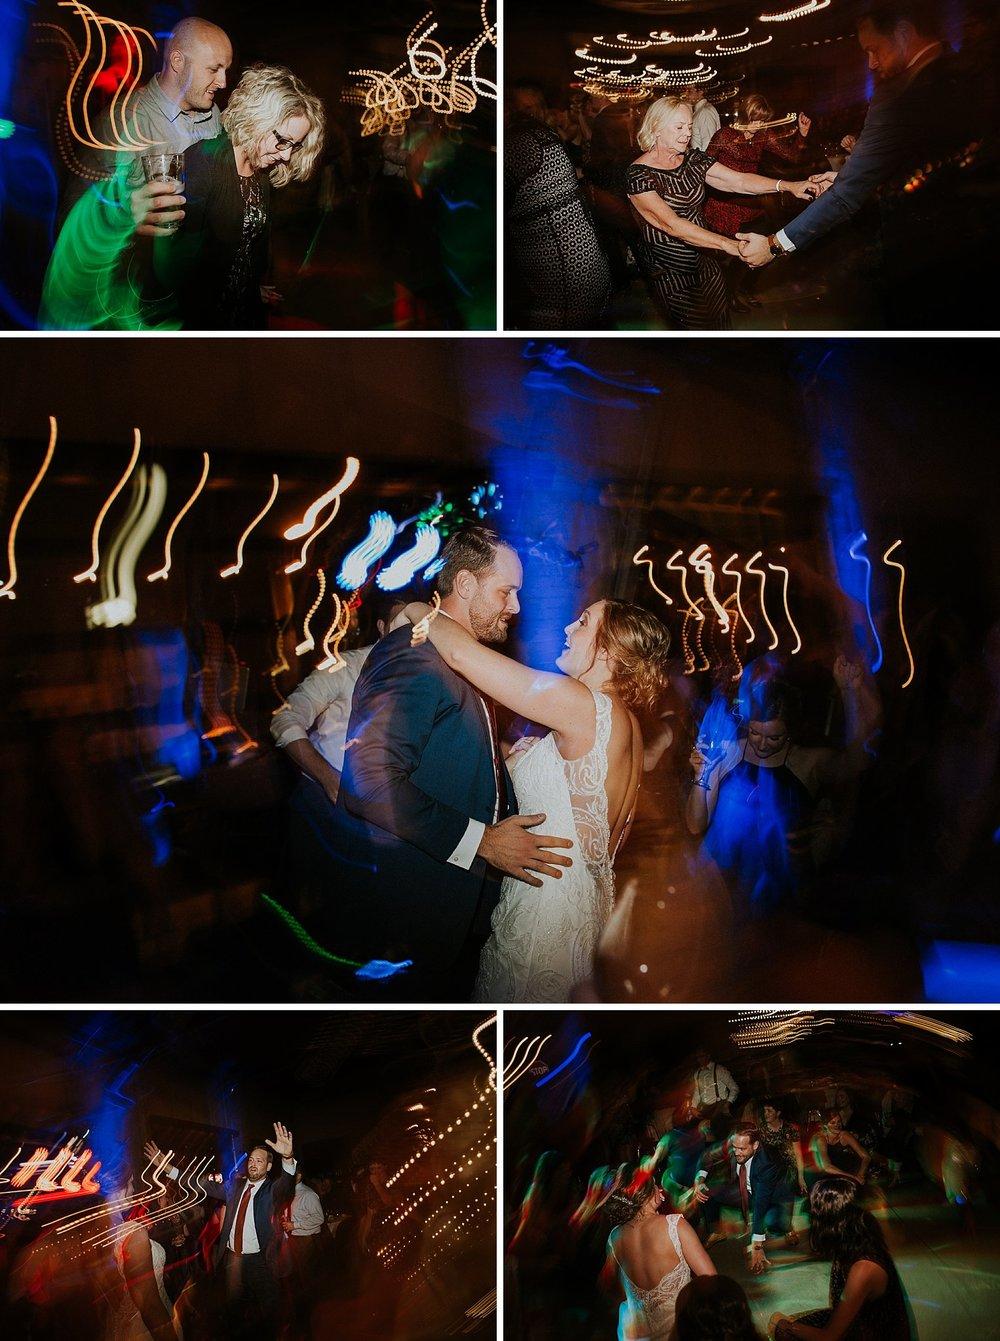 Vince-Caitlin_Milwaukee-South-Second-wedding_liller-photo_0087.jpg